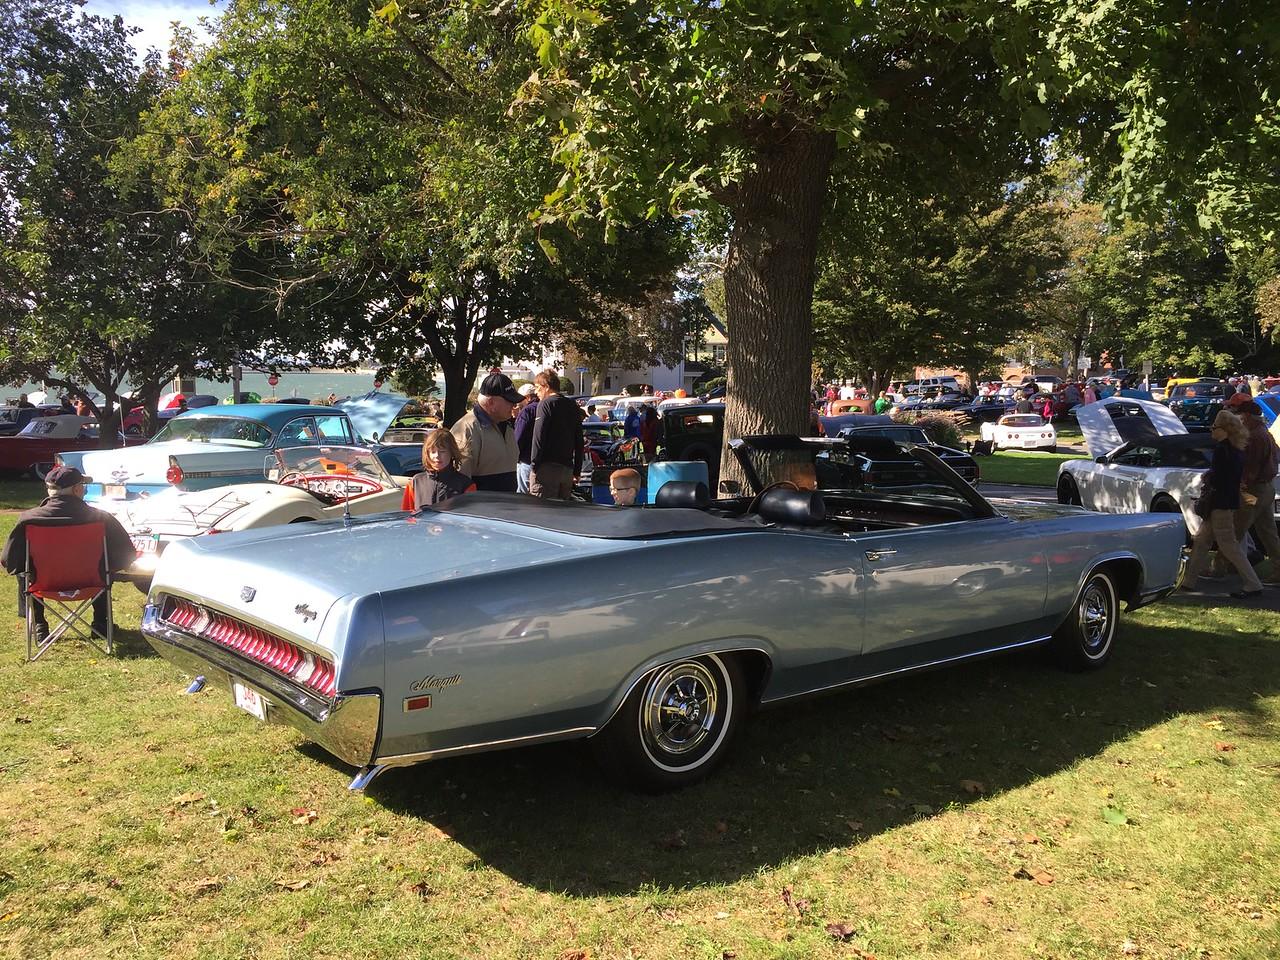 Mercury Marquis. Longest car at the show?